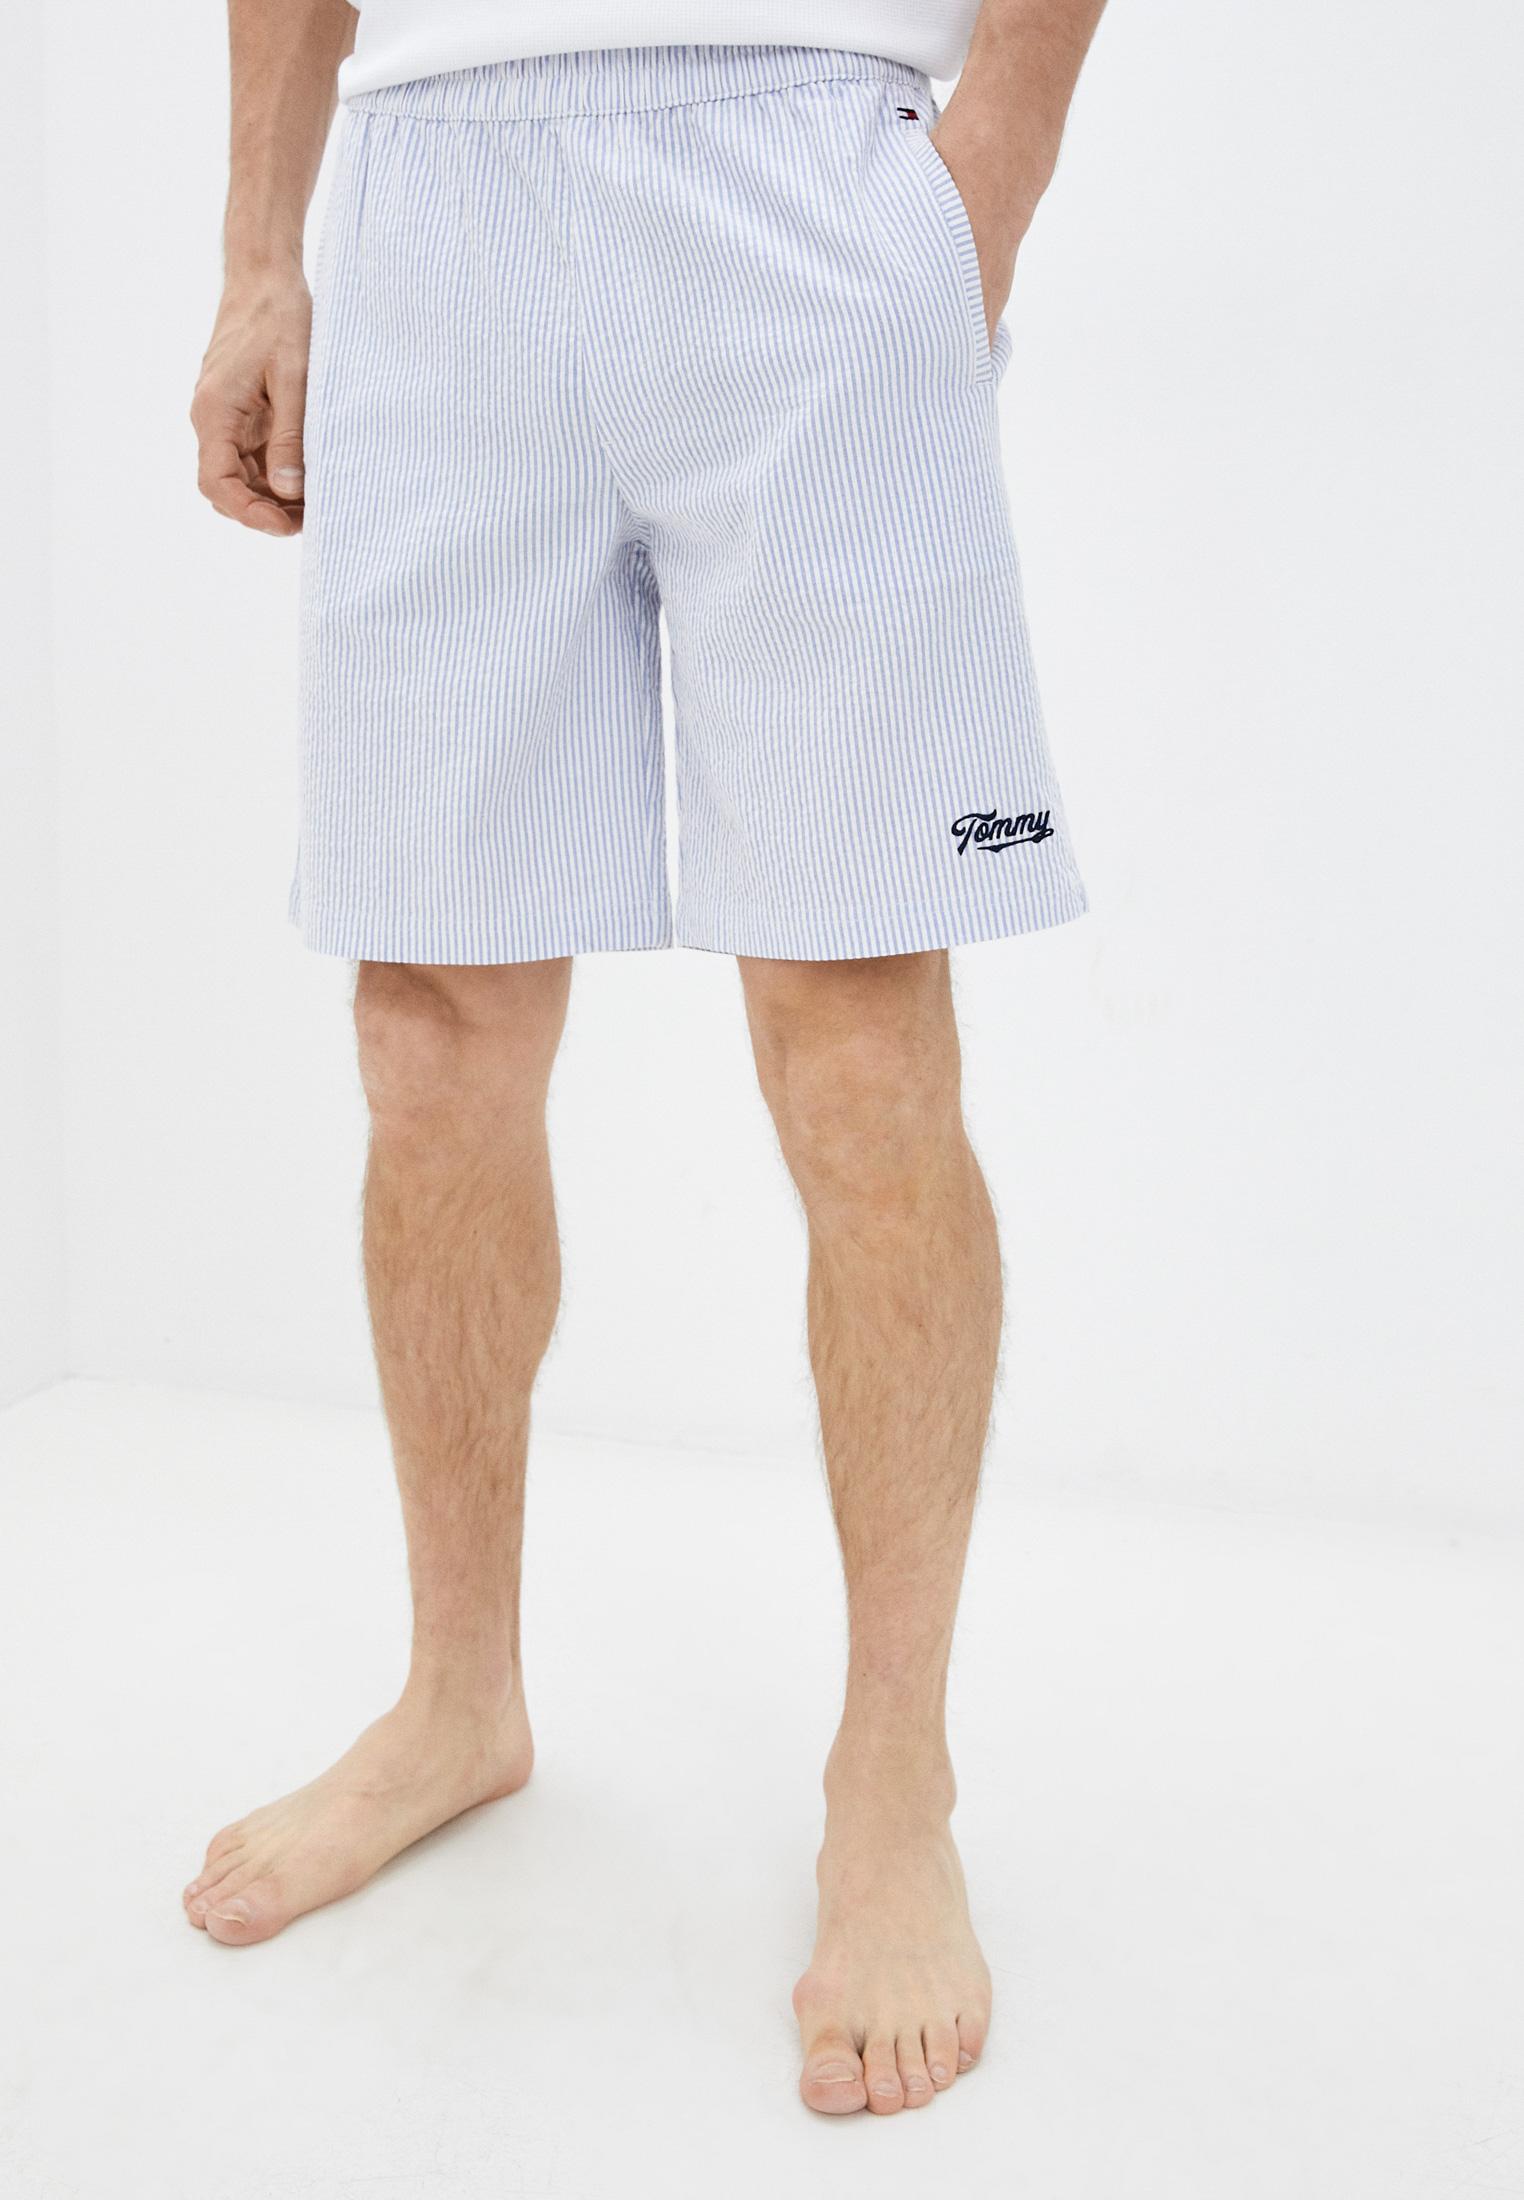 Мужские домашние брюки Tommy Hilfiger (Томми Хилфигер) Шорты домашние Tommy Hilfiger